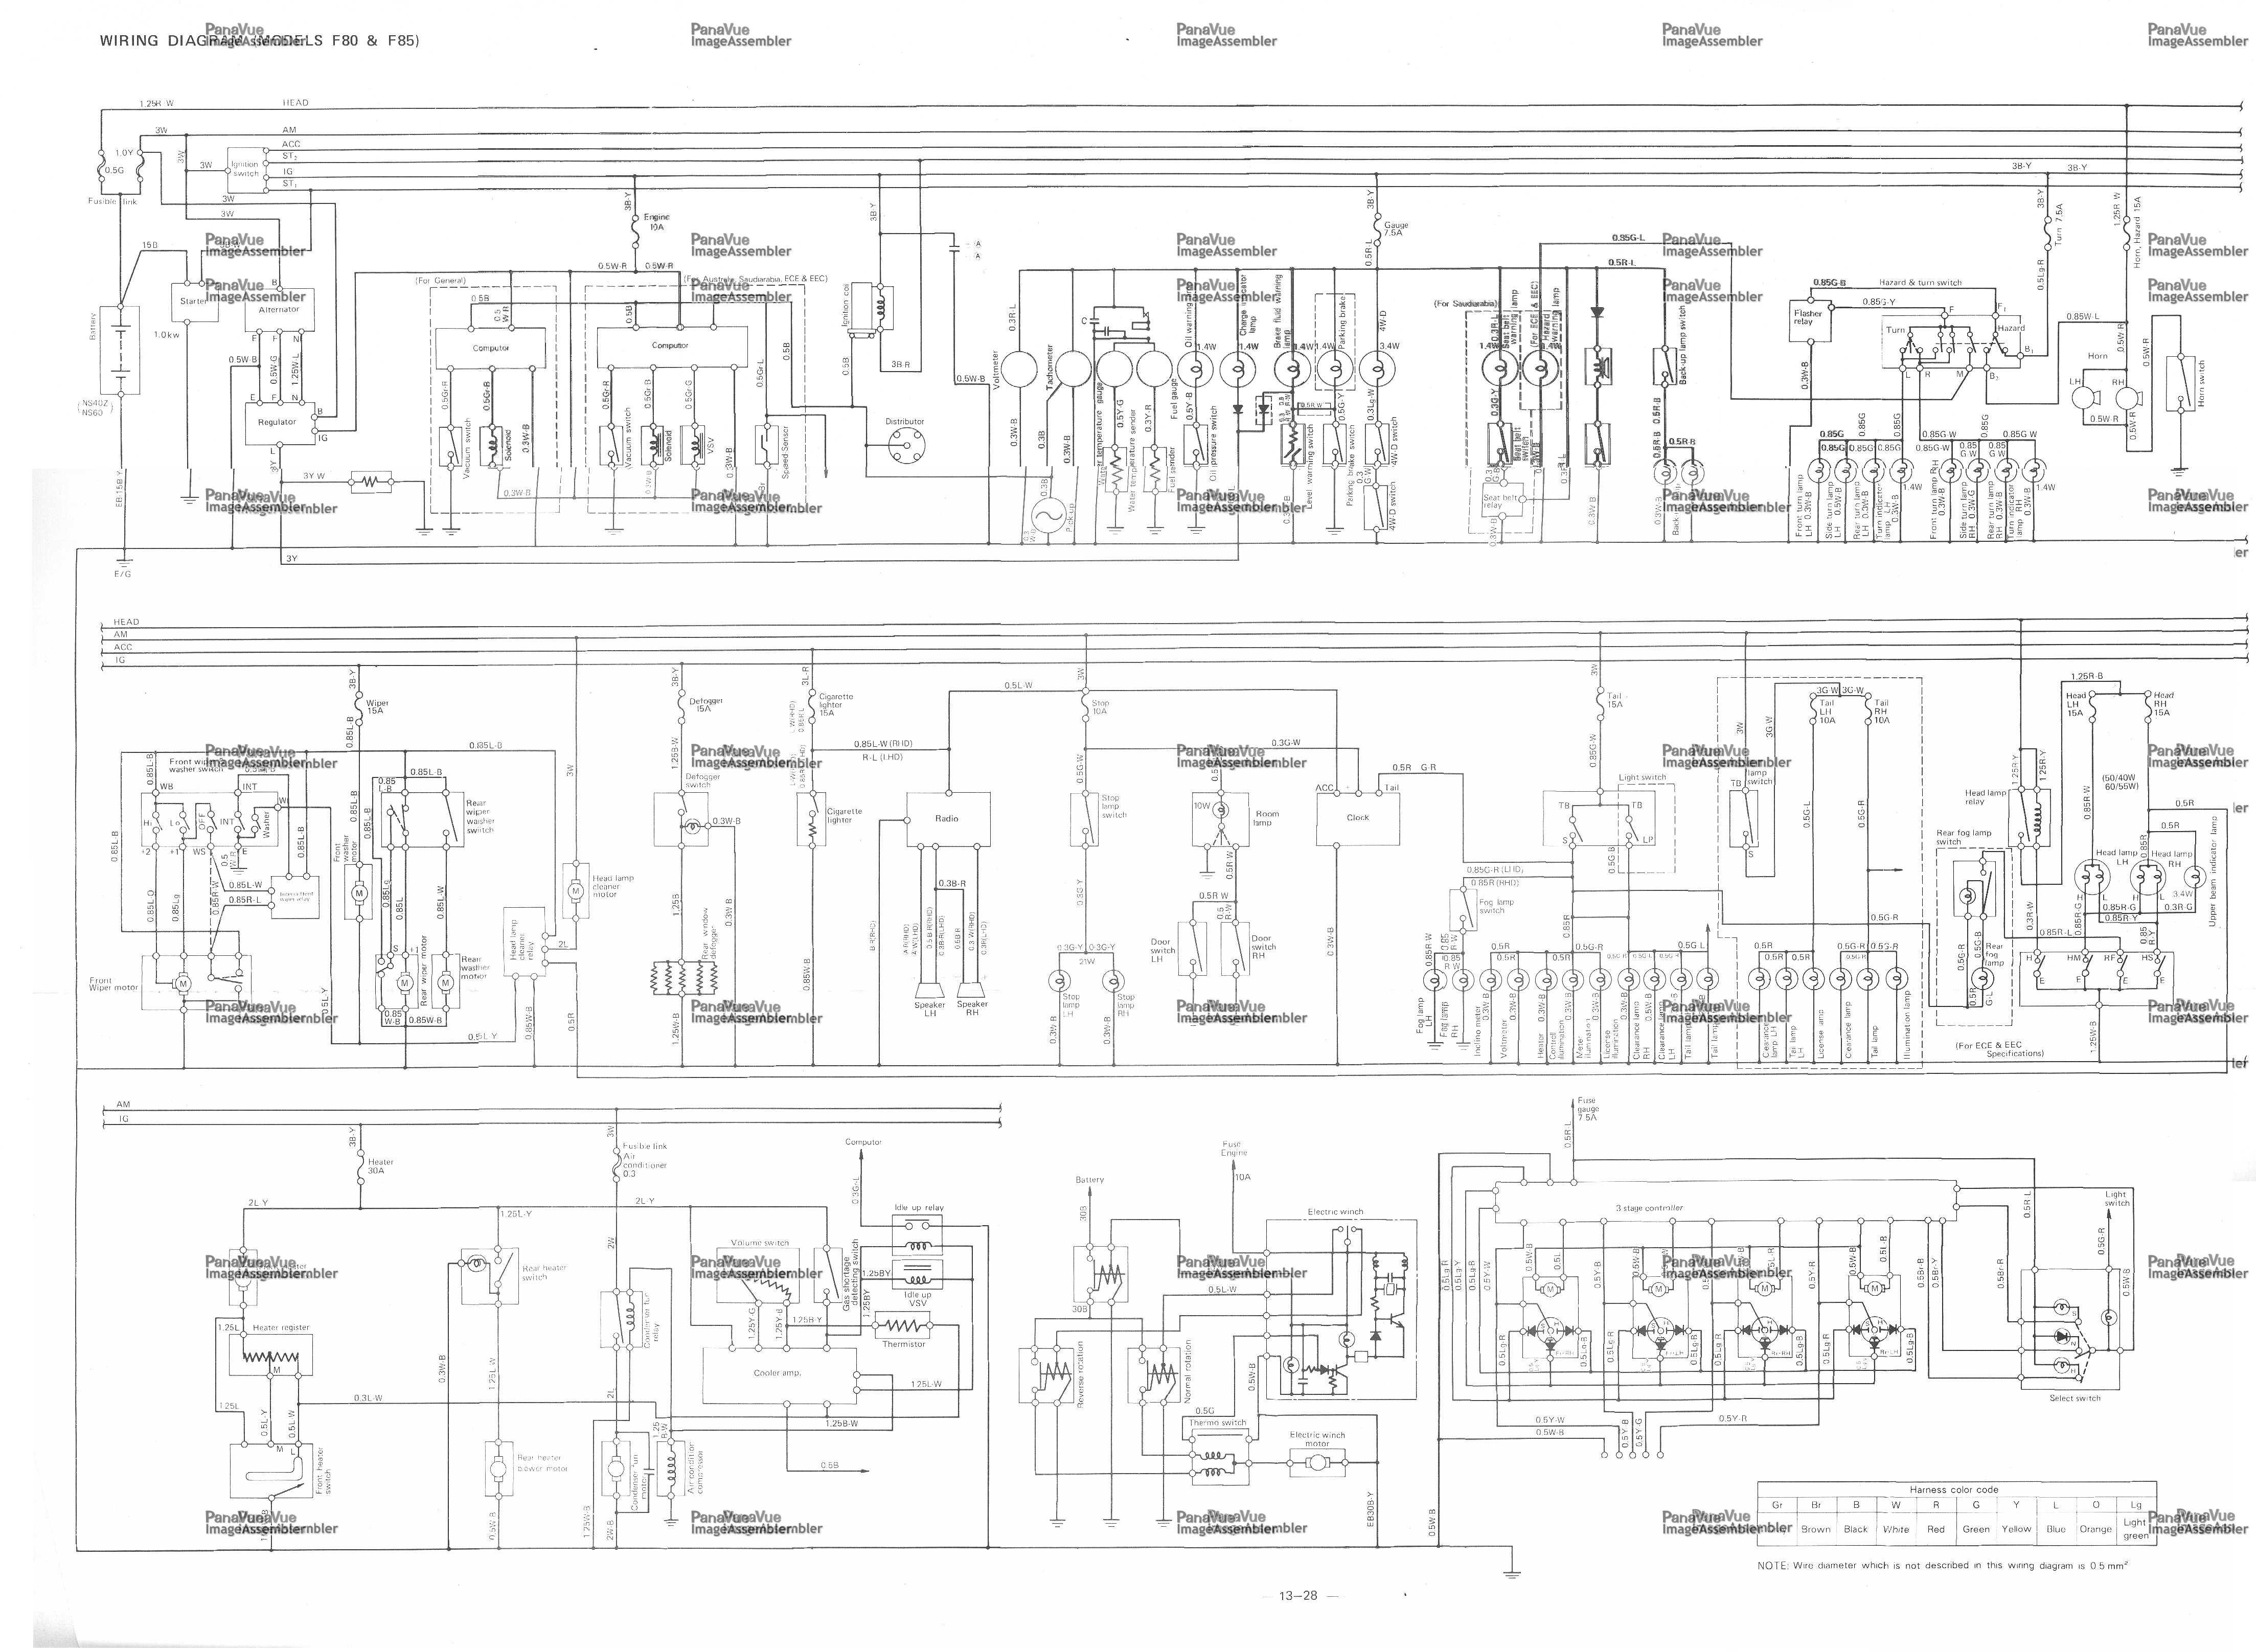 Wiring Diagram Daihatsu Charade G11 Kustom Amp Schematic Doorchime Kdx 200 Jeanjaures37 Fr